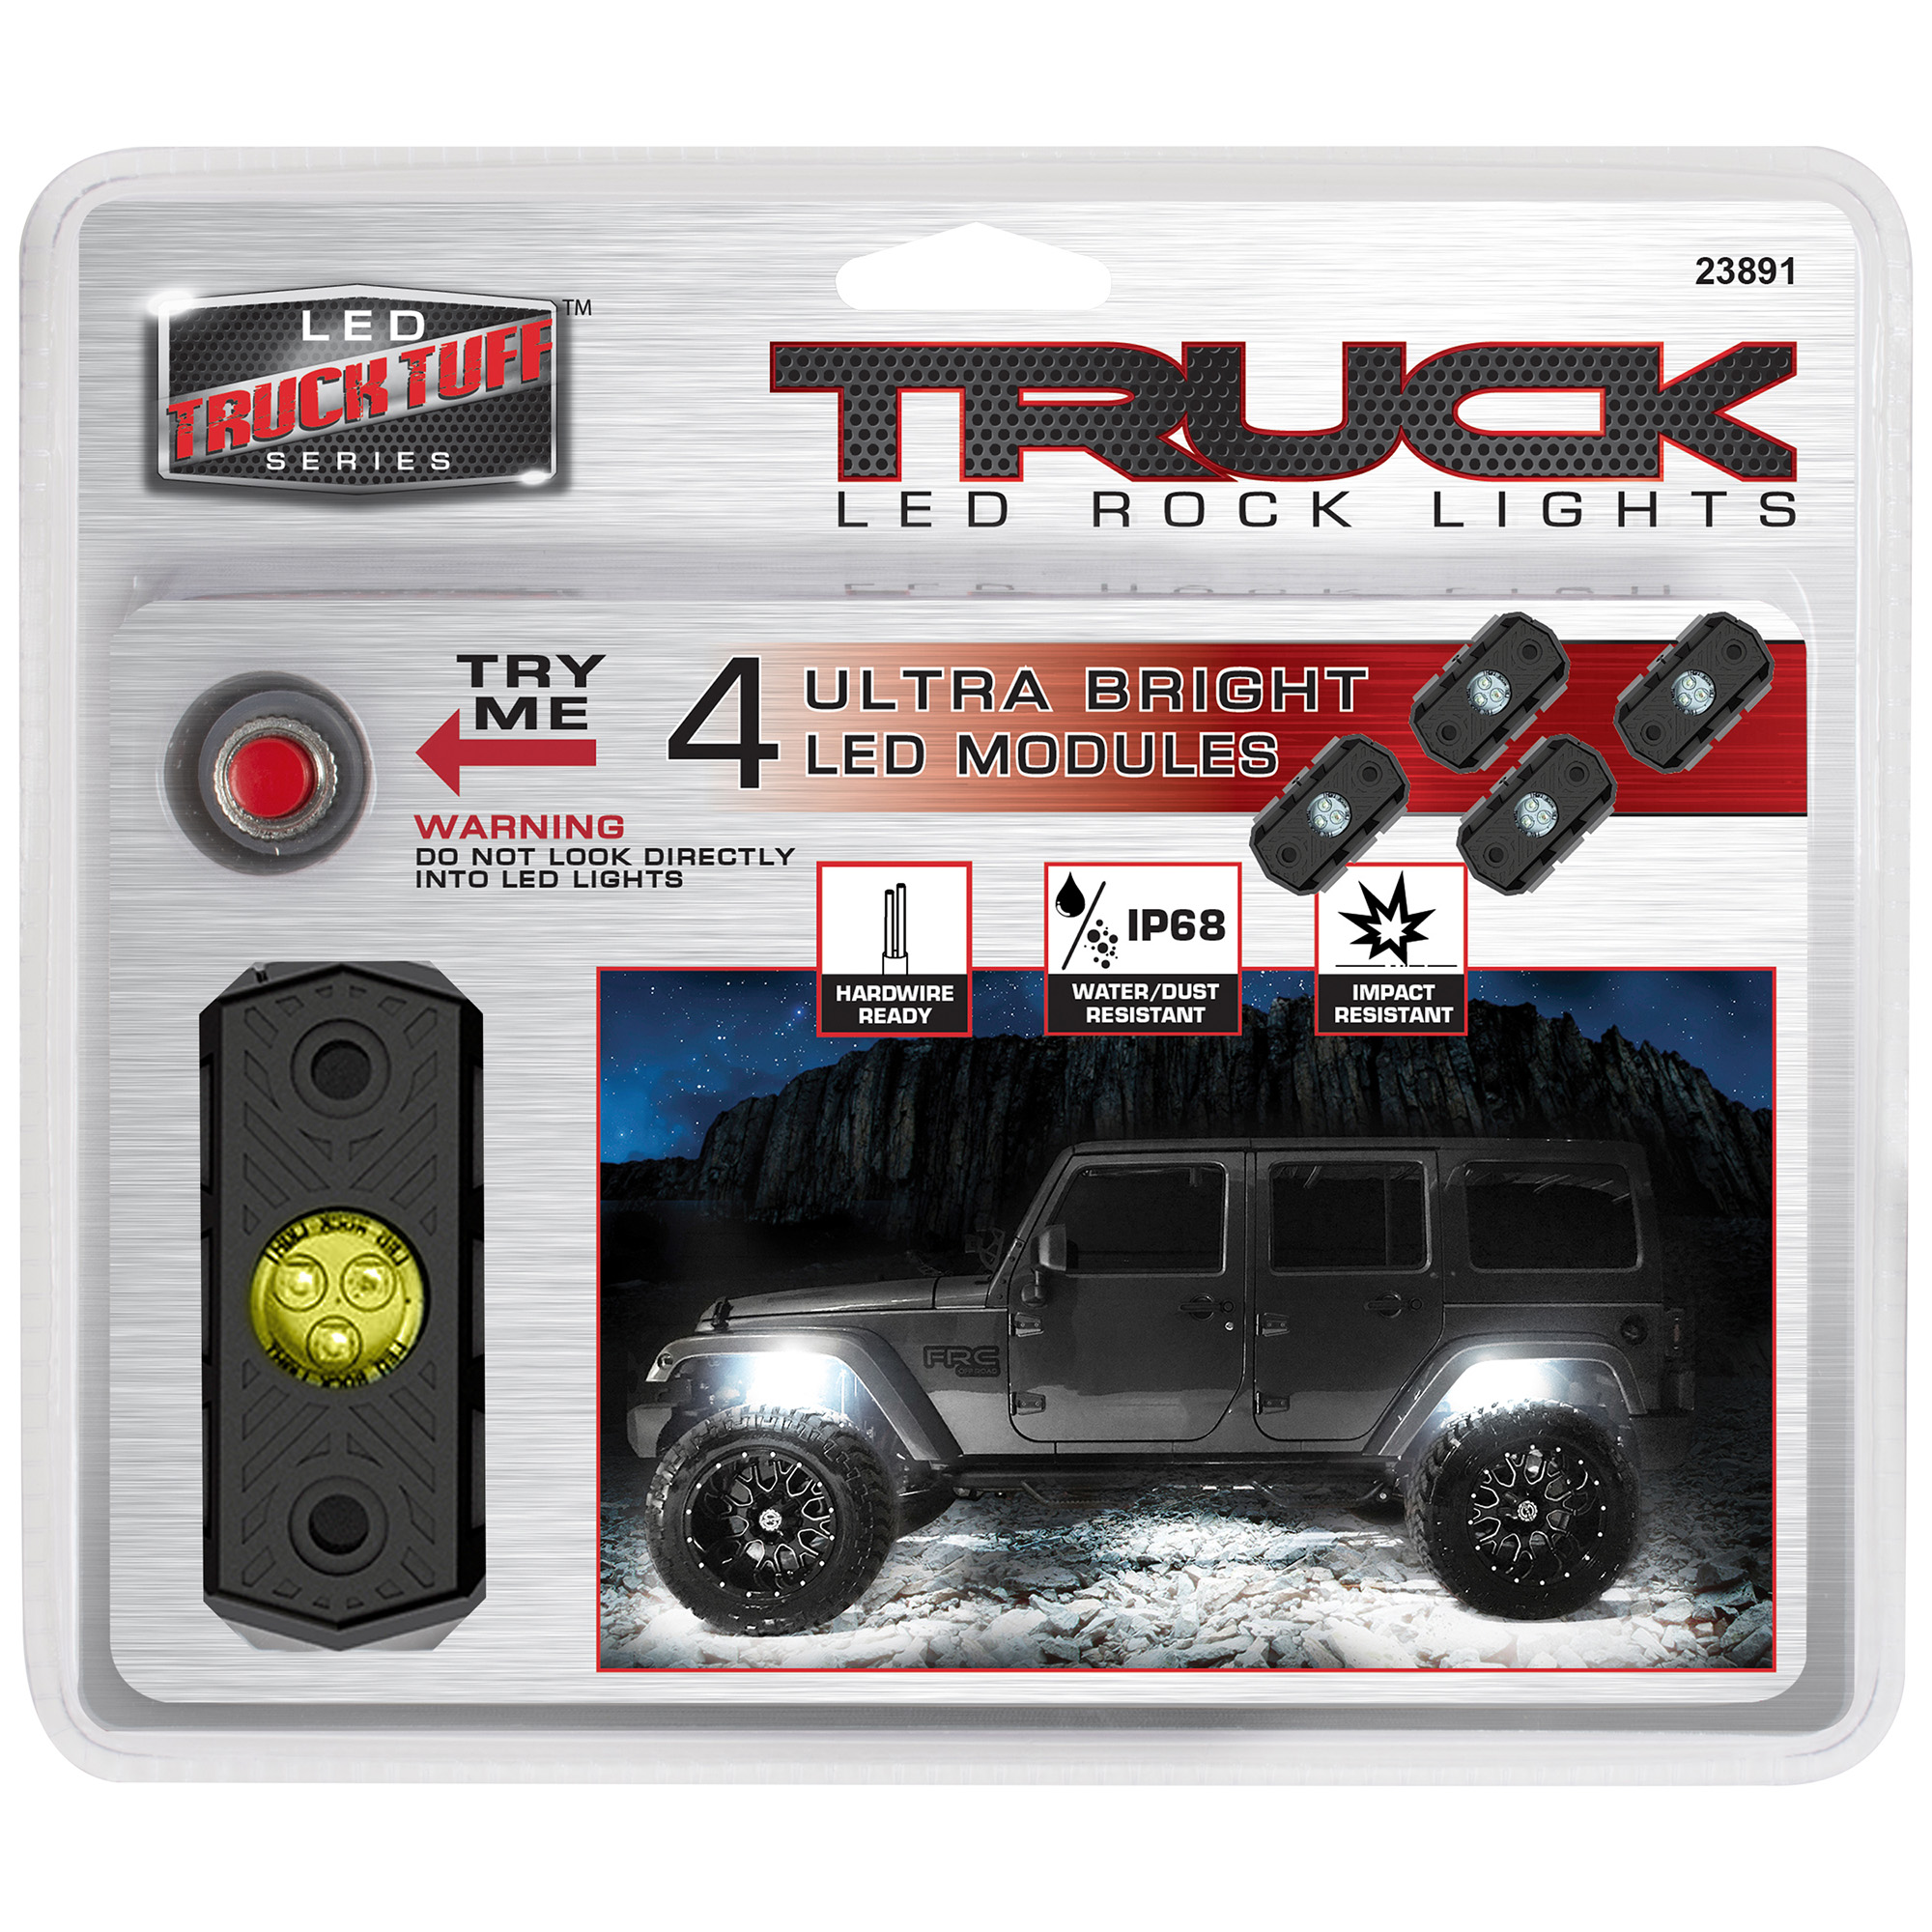 8 Pcs Rock Light 2 Inch CREE LED JEEP Wrangler Off-Road Under Wheel Light White Crawler Crawling